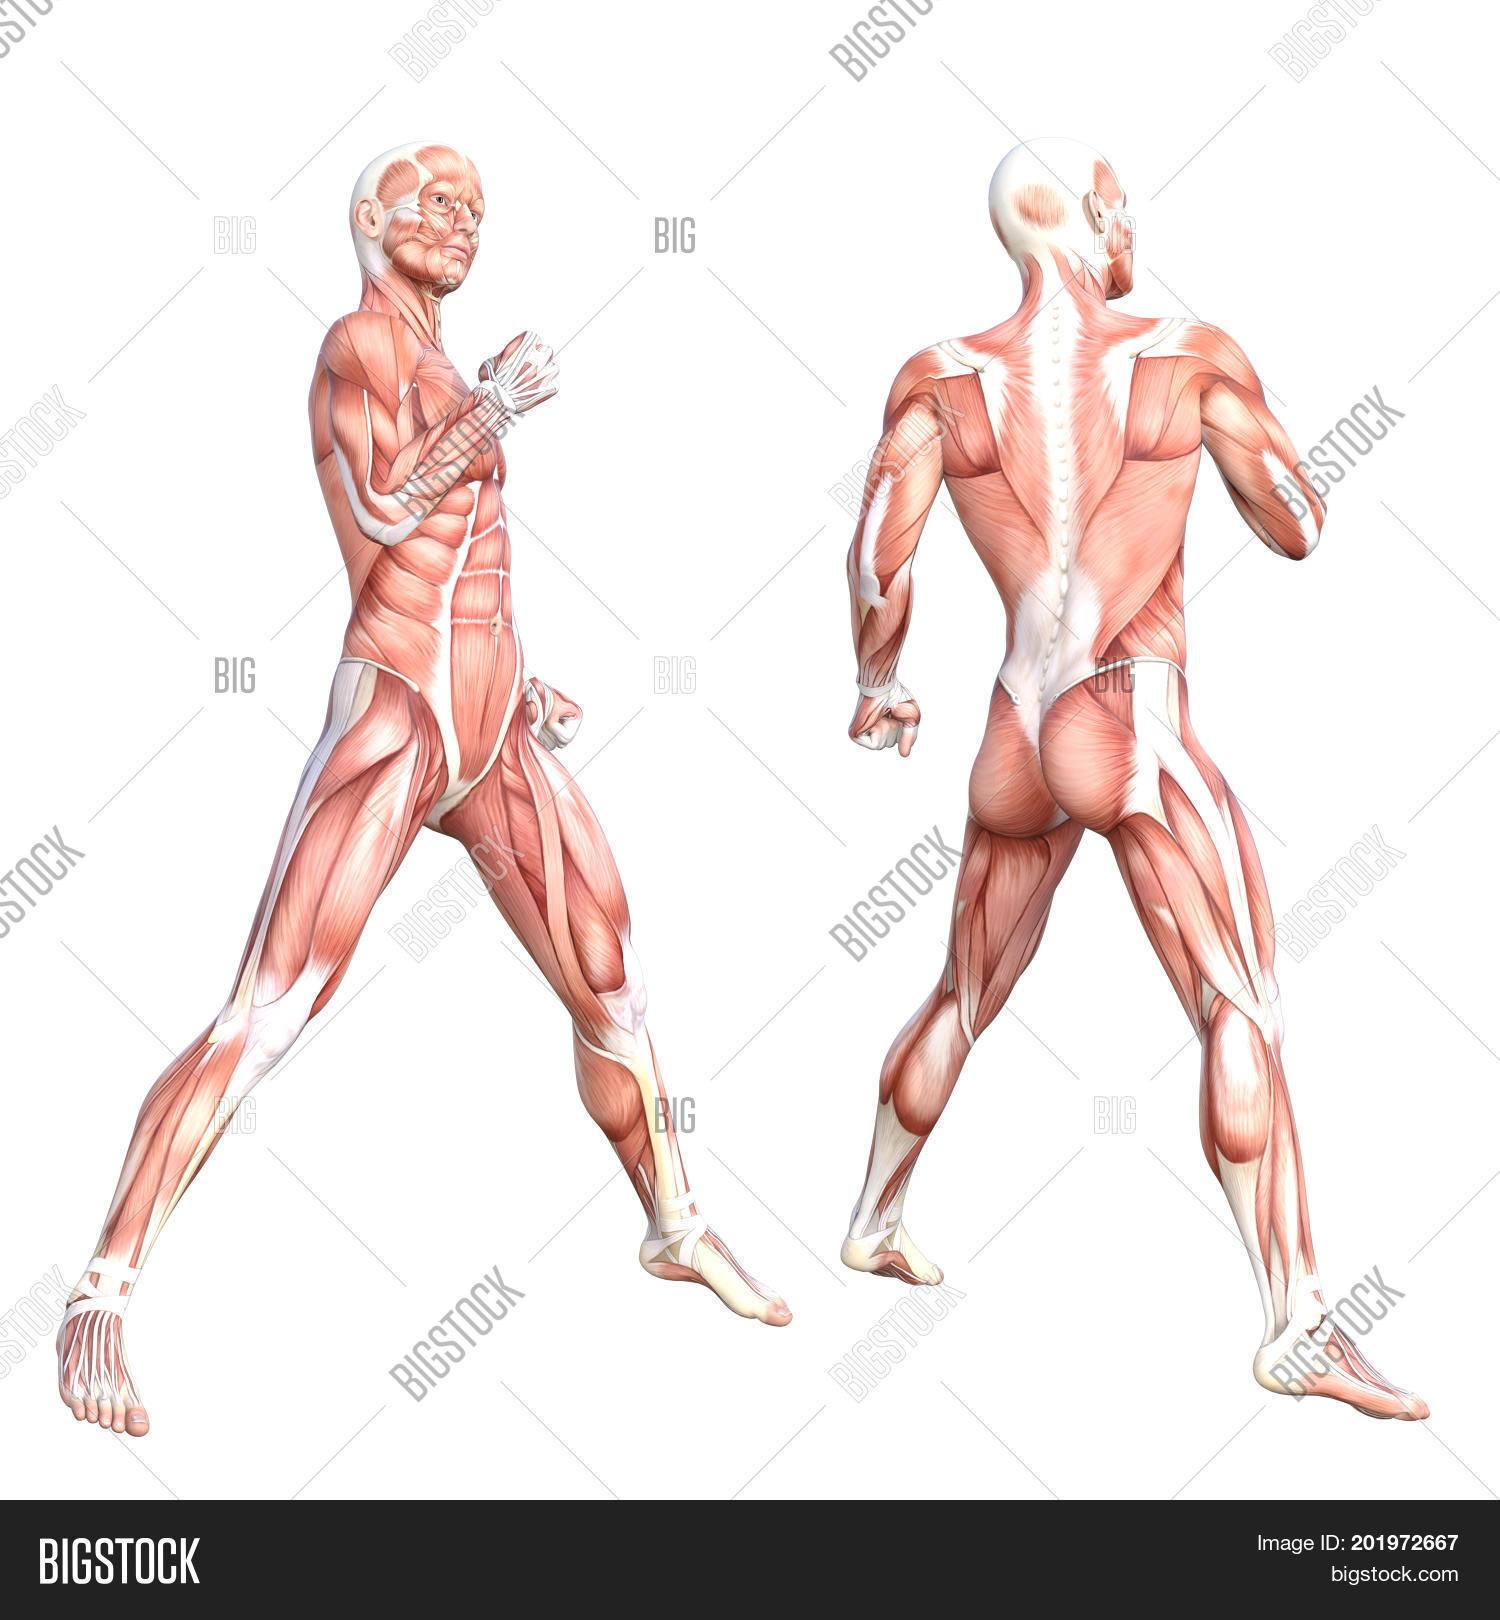 Conceptual Anatomy Image Photo Free Trial Bigstock